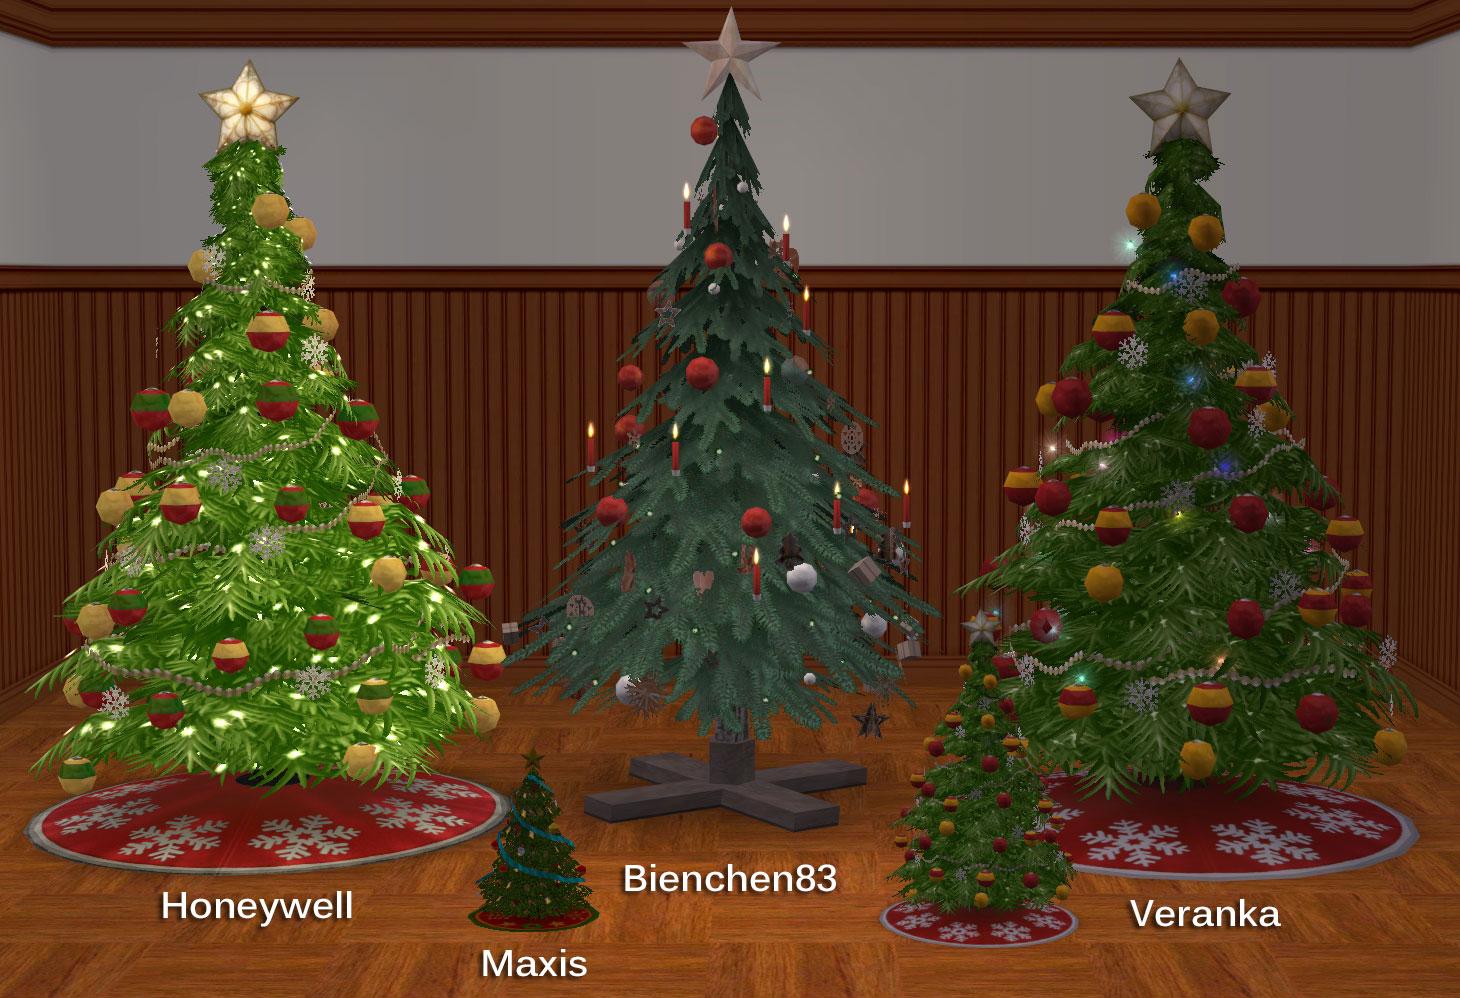 Sims 3 Christmas Tree.Mod The Sims Summon Santa W Cc Christmas Trees